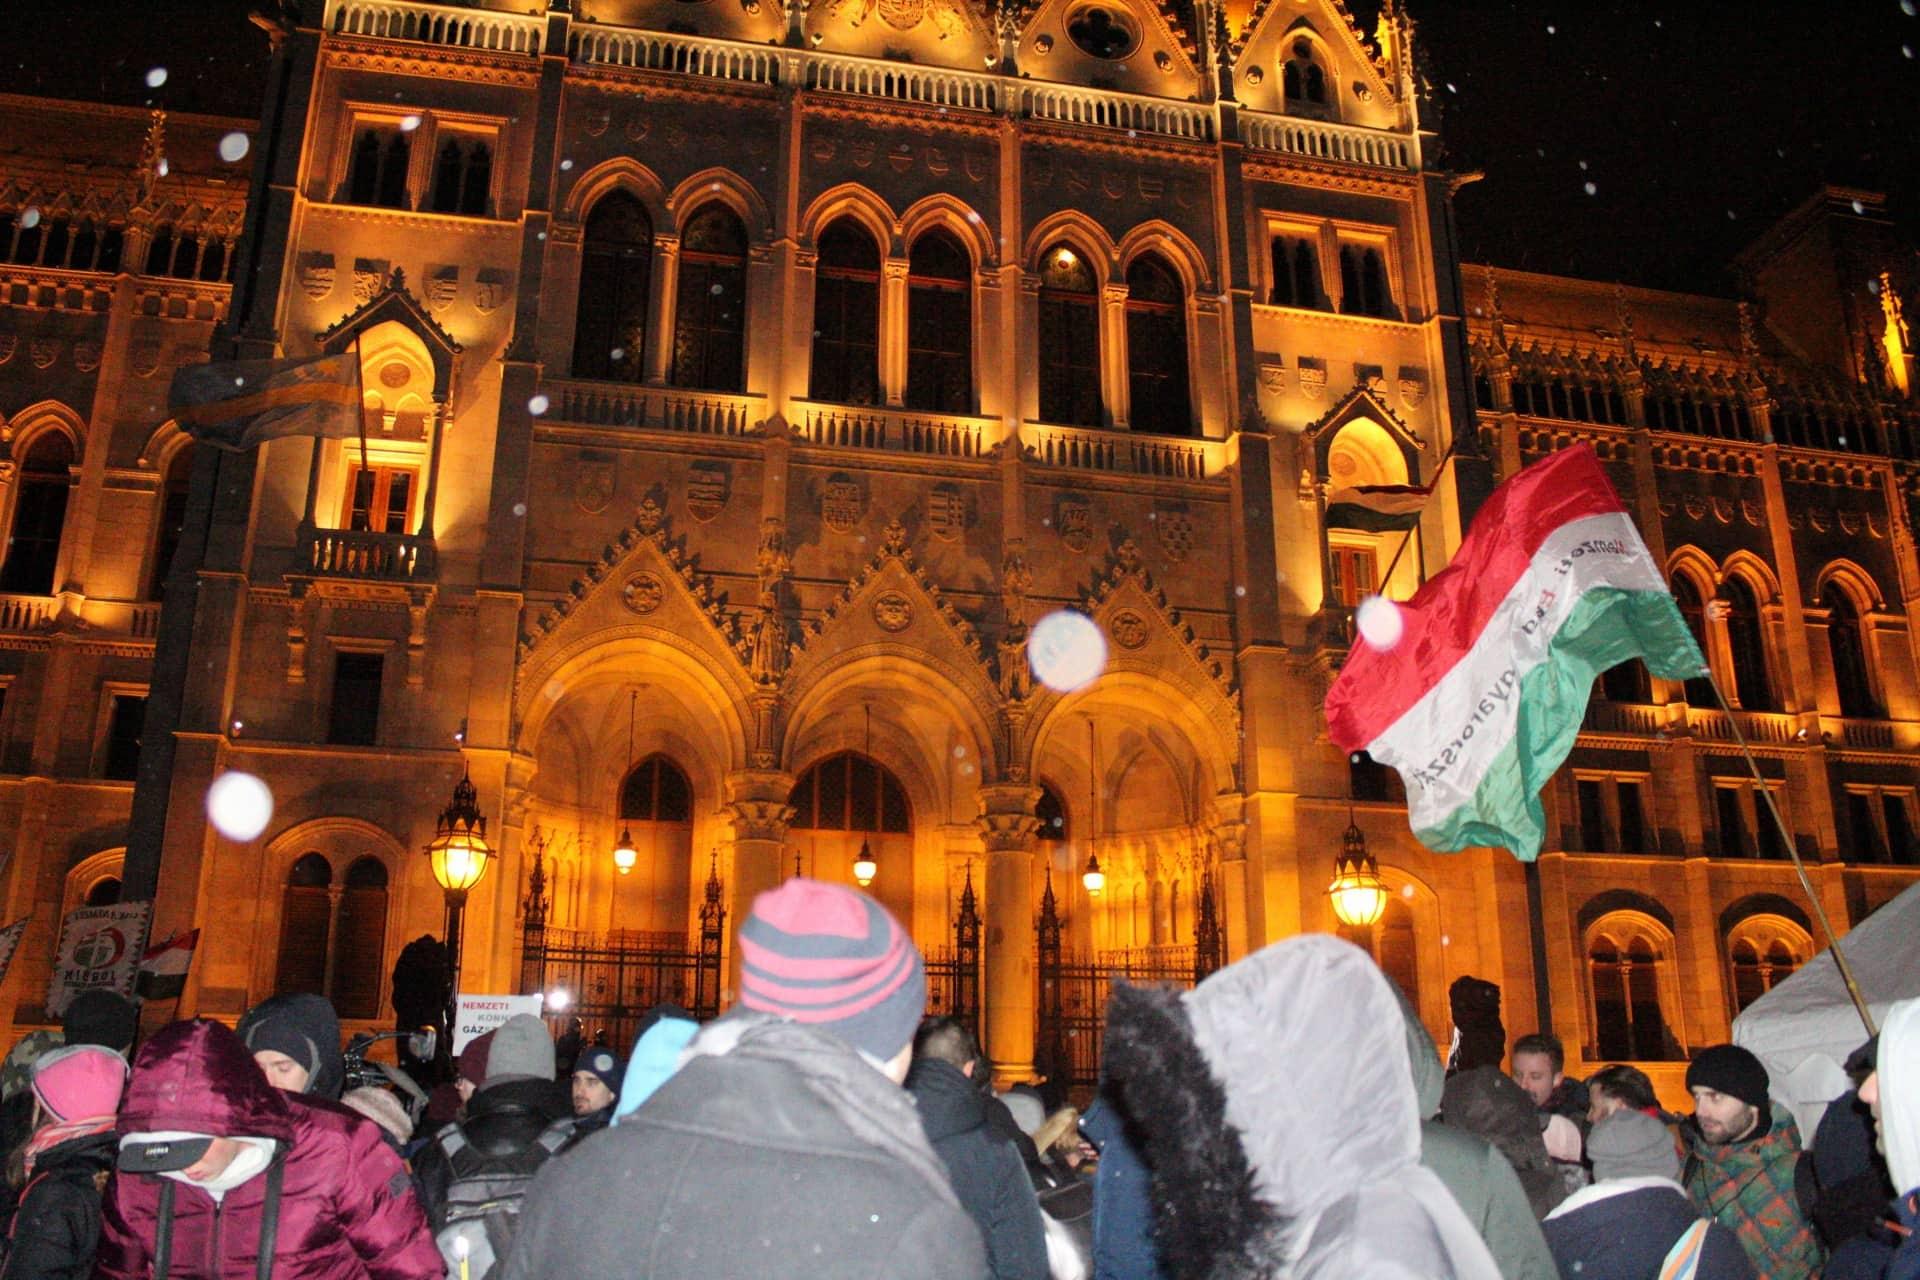 rabszolga_torveny_elleni_tuntetes_kossuth_ter_magyar_zaszlo_hoeses_politika_demonstracio_2018_december.jpg